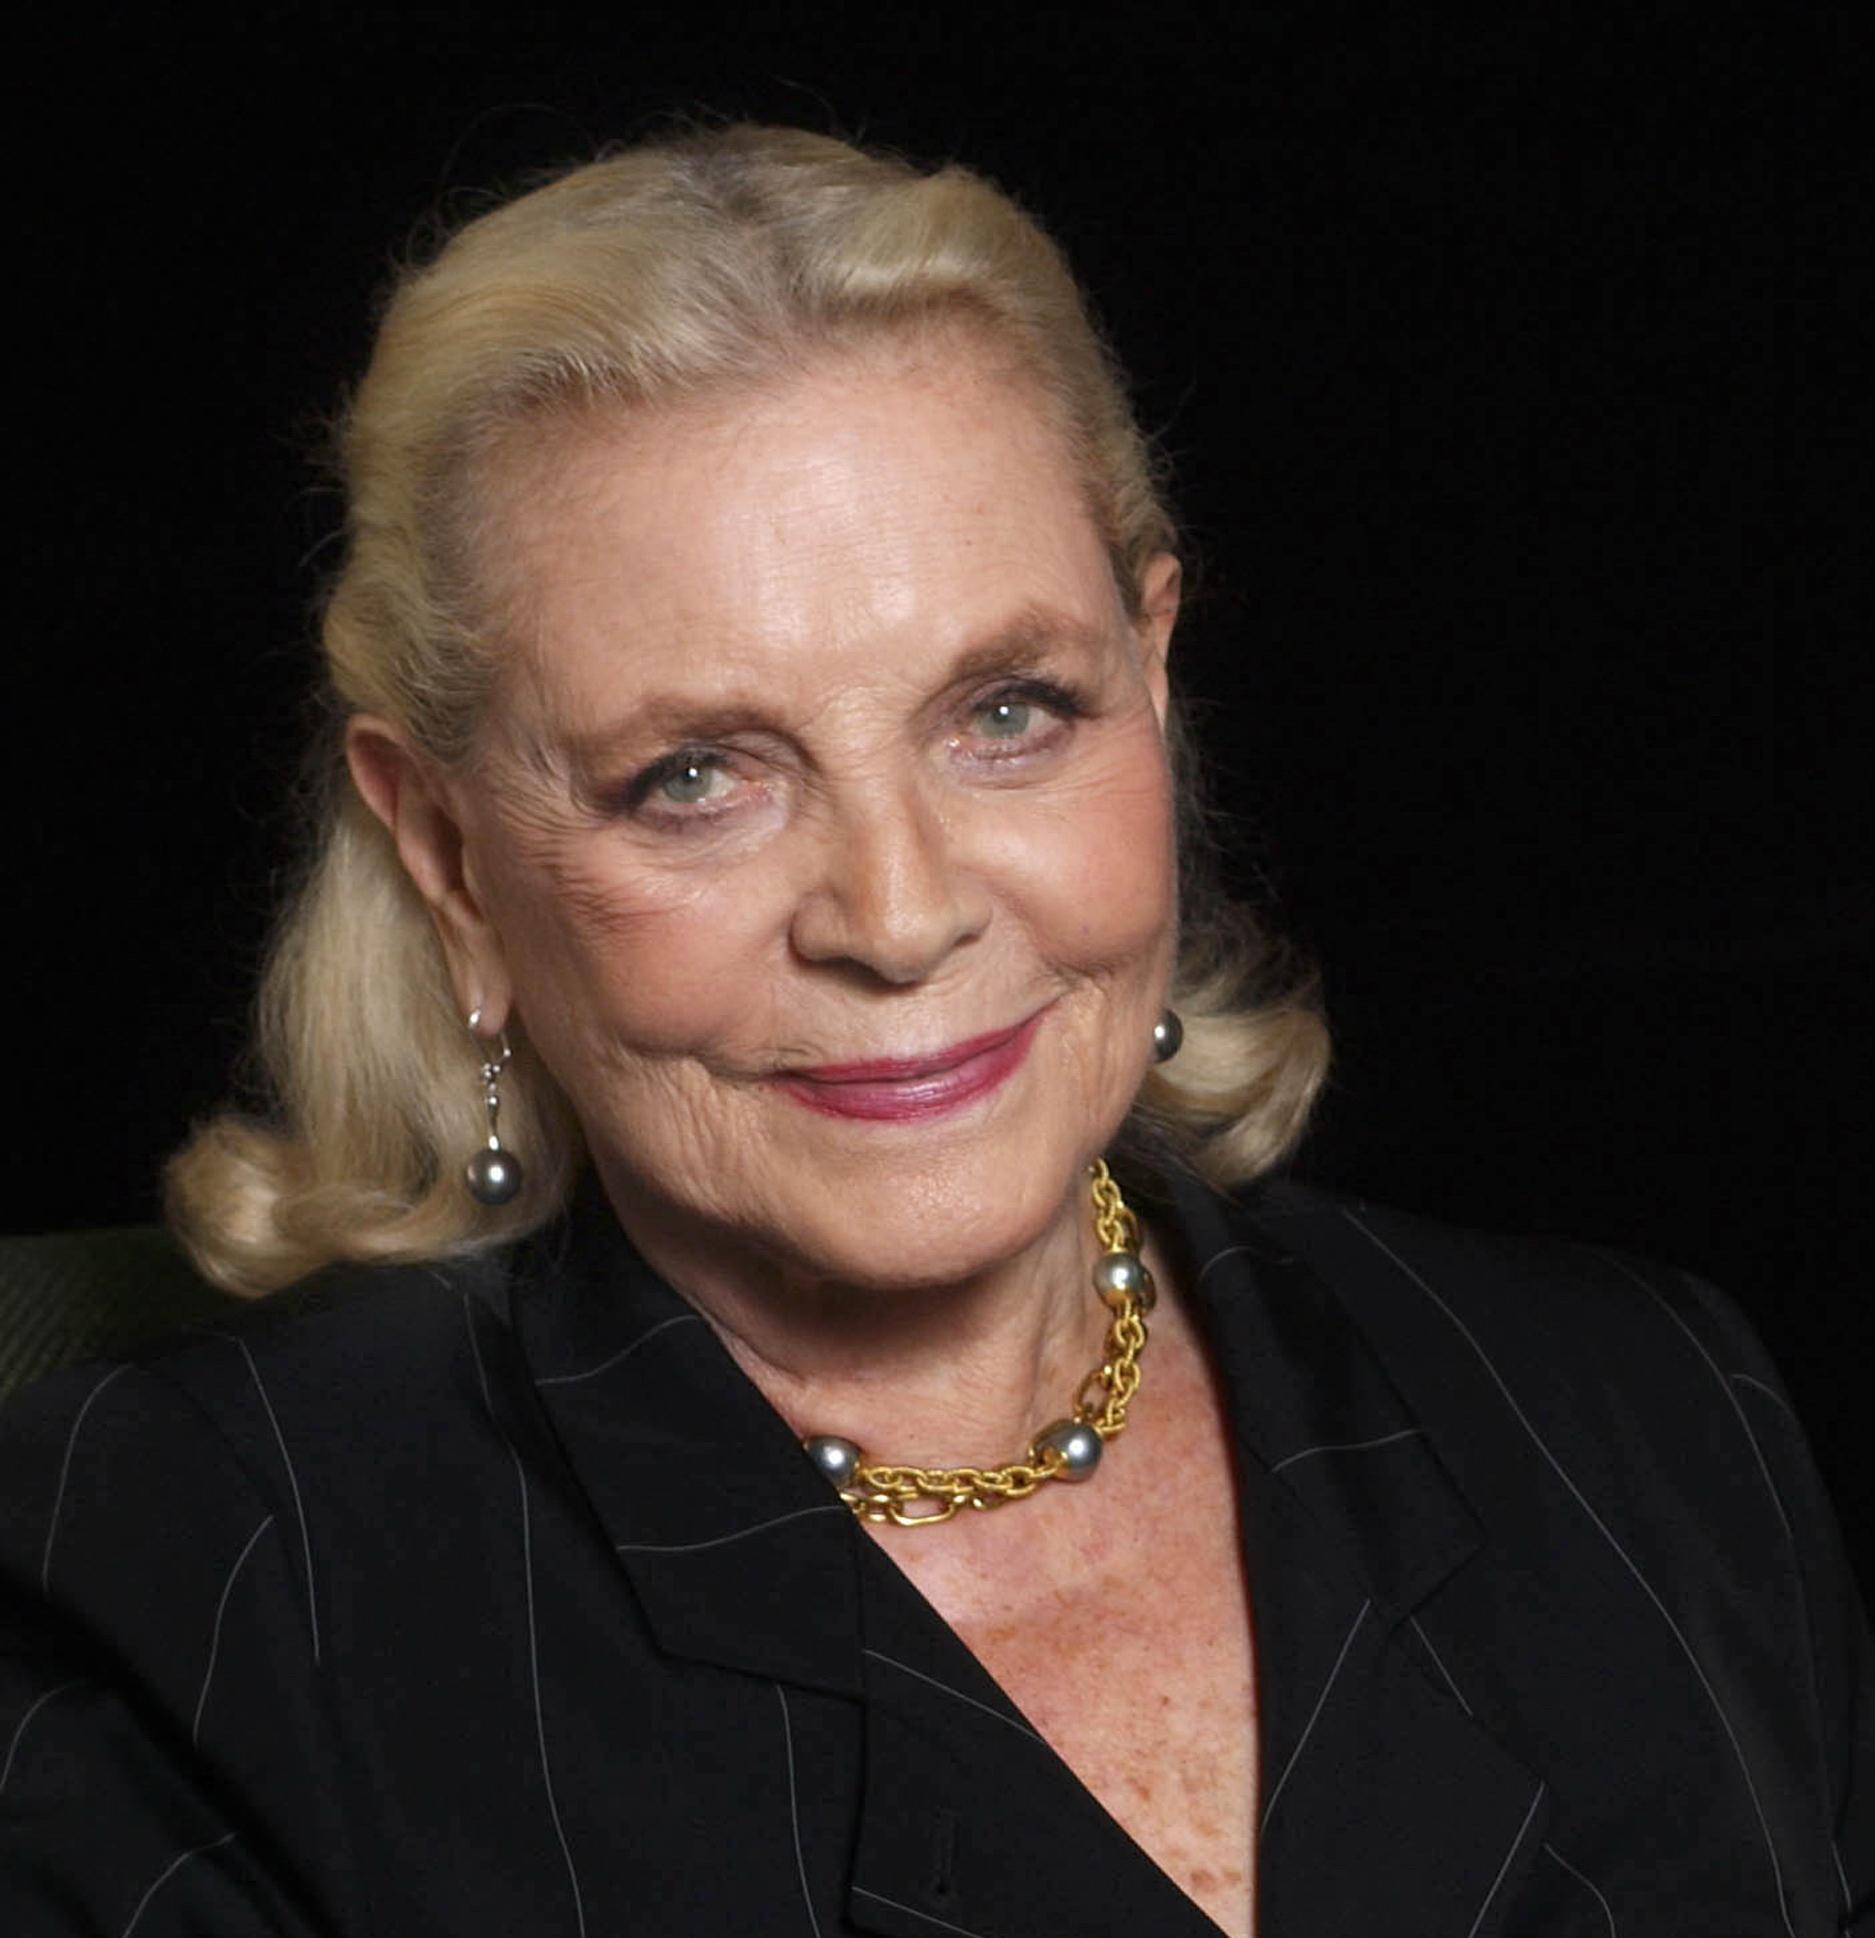 obituary lauren bacall legendary huskyvoiced hollywood